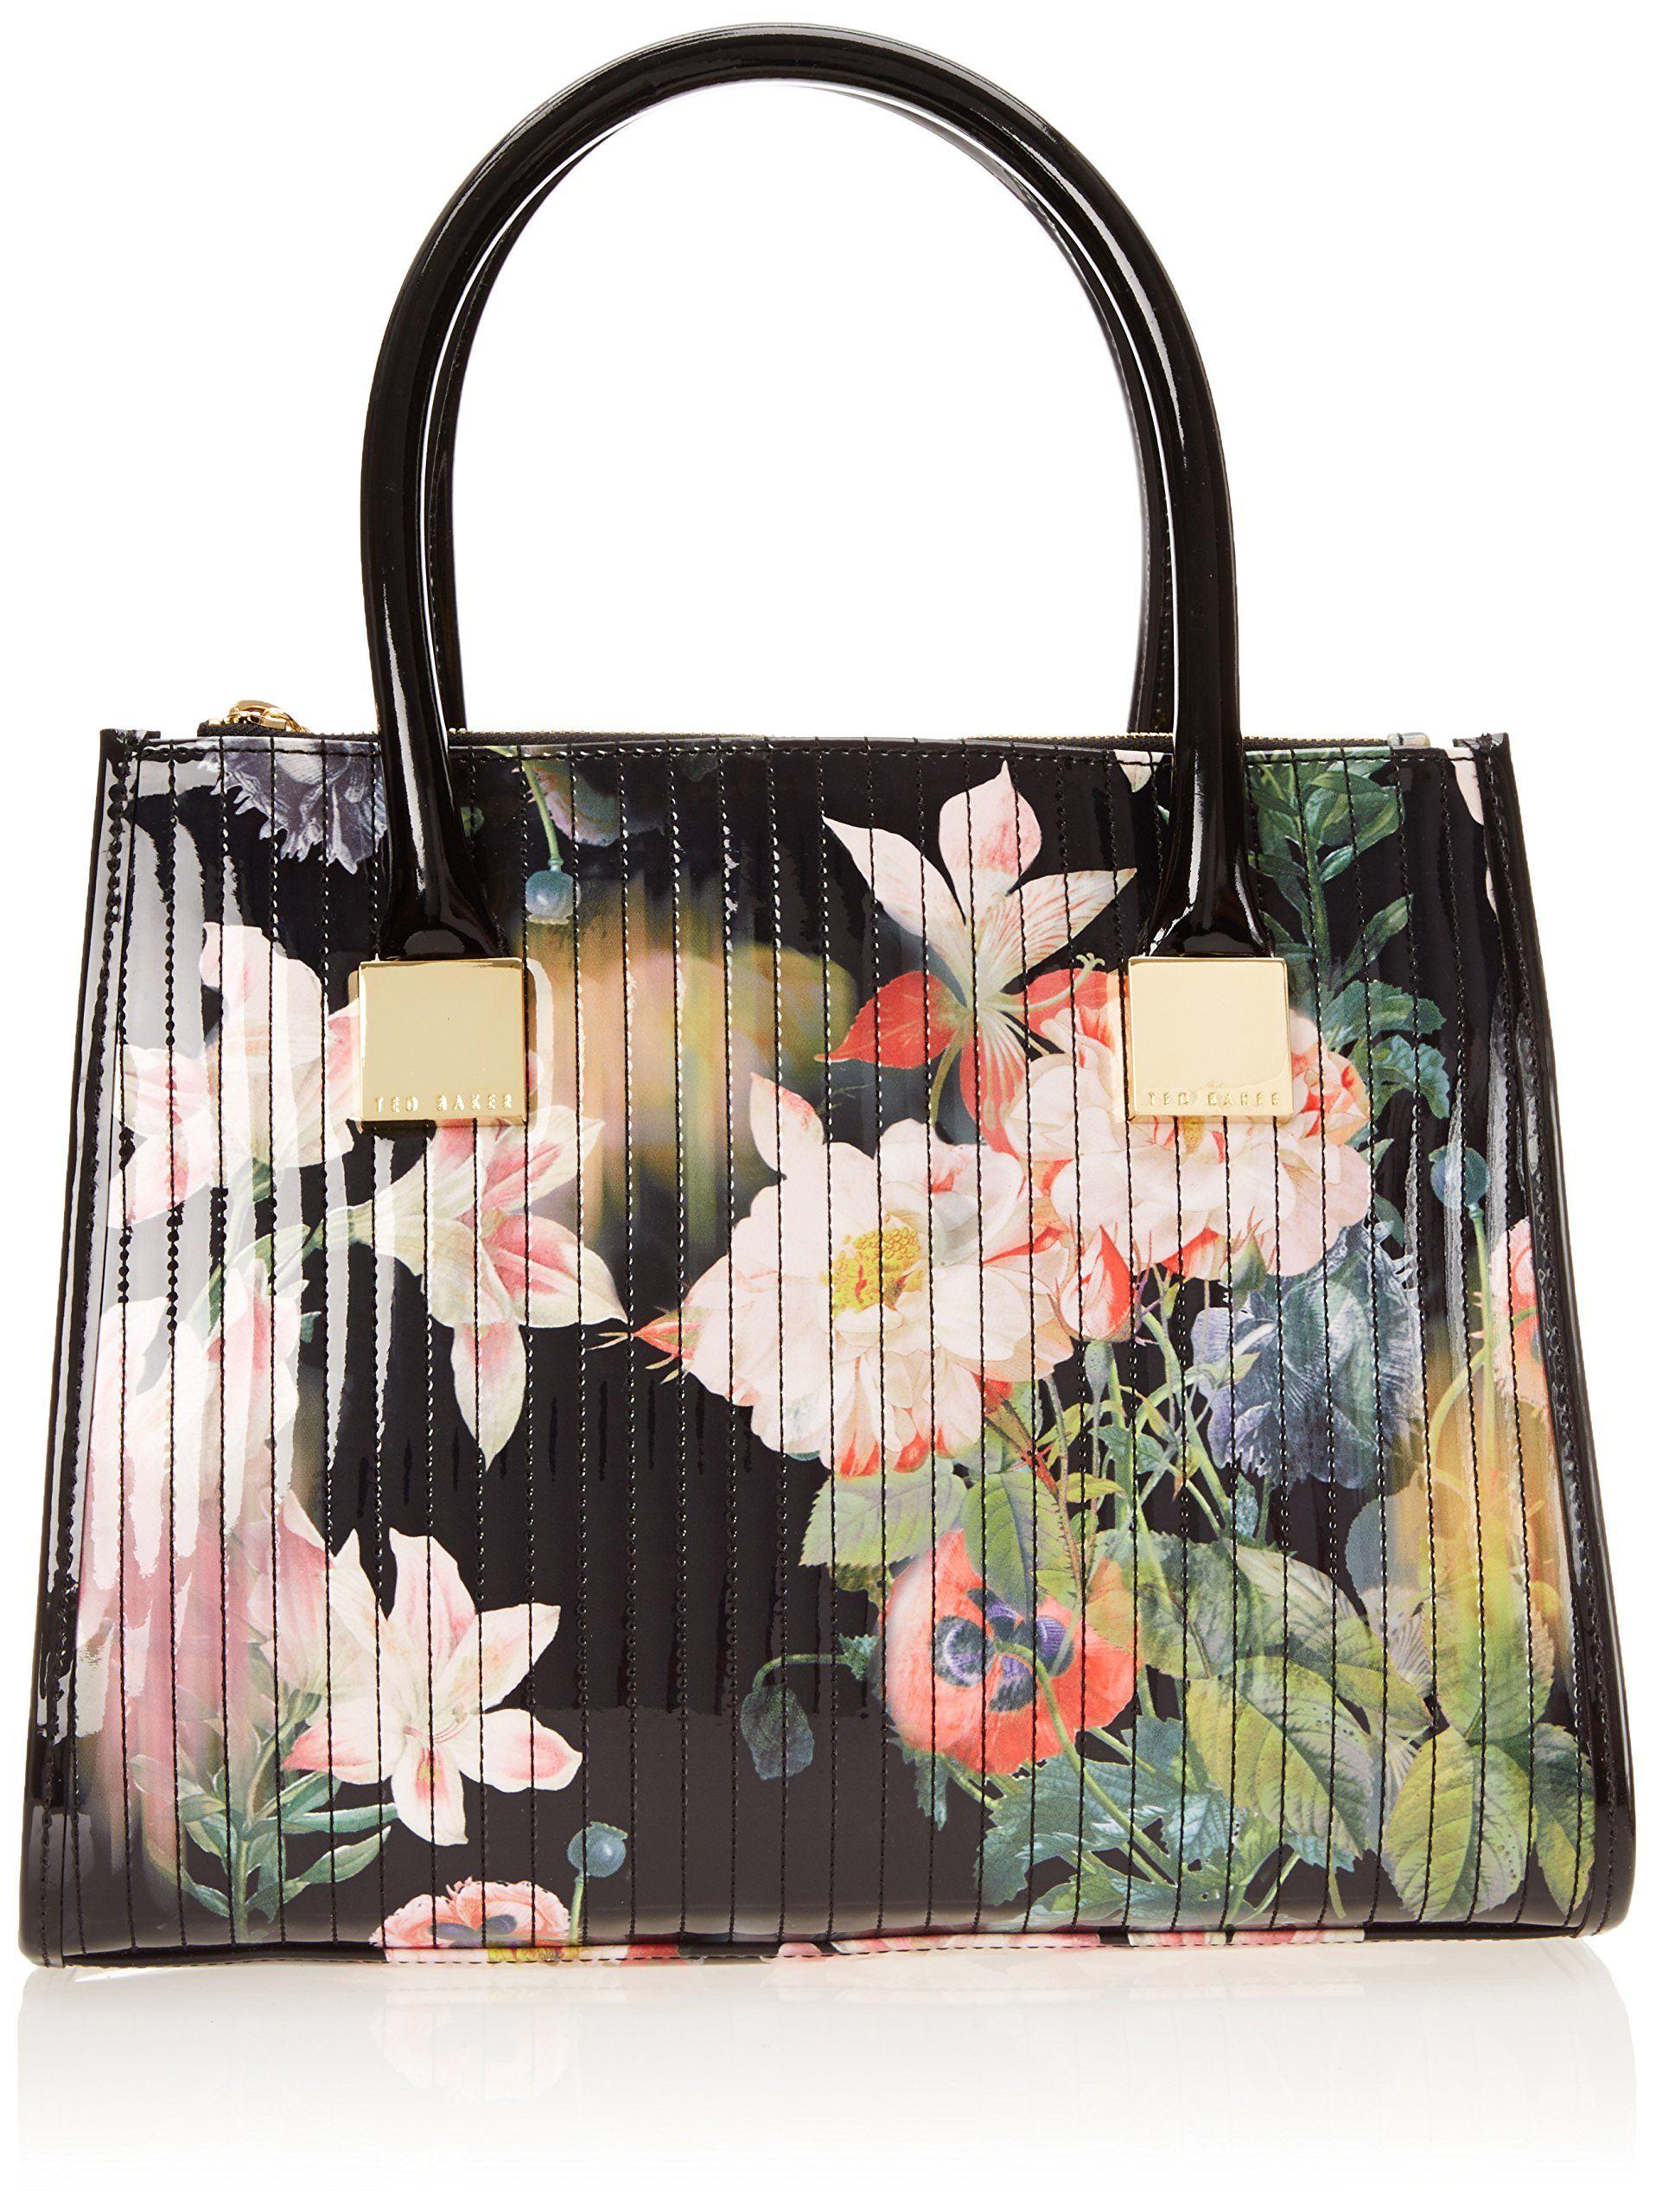 090b6bb4088 Ted Baker Opulent Bloom Print Tote,Black,One Size Ladies Bag $270.00 ...